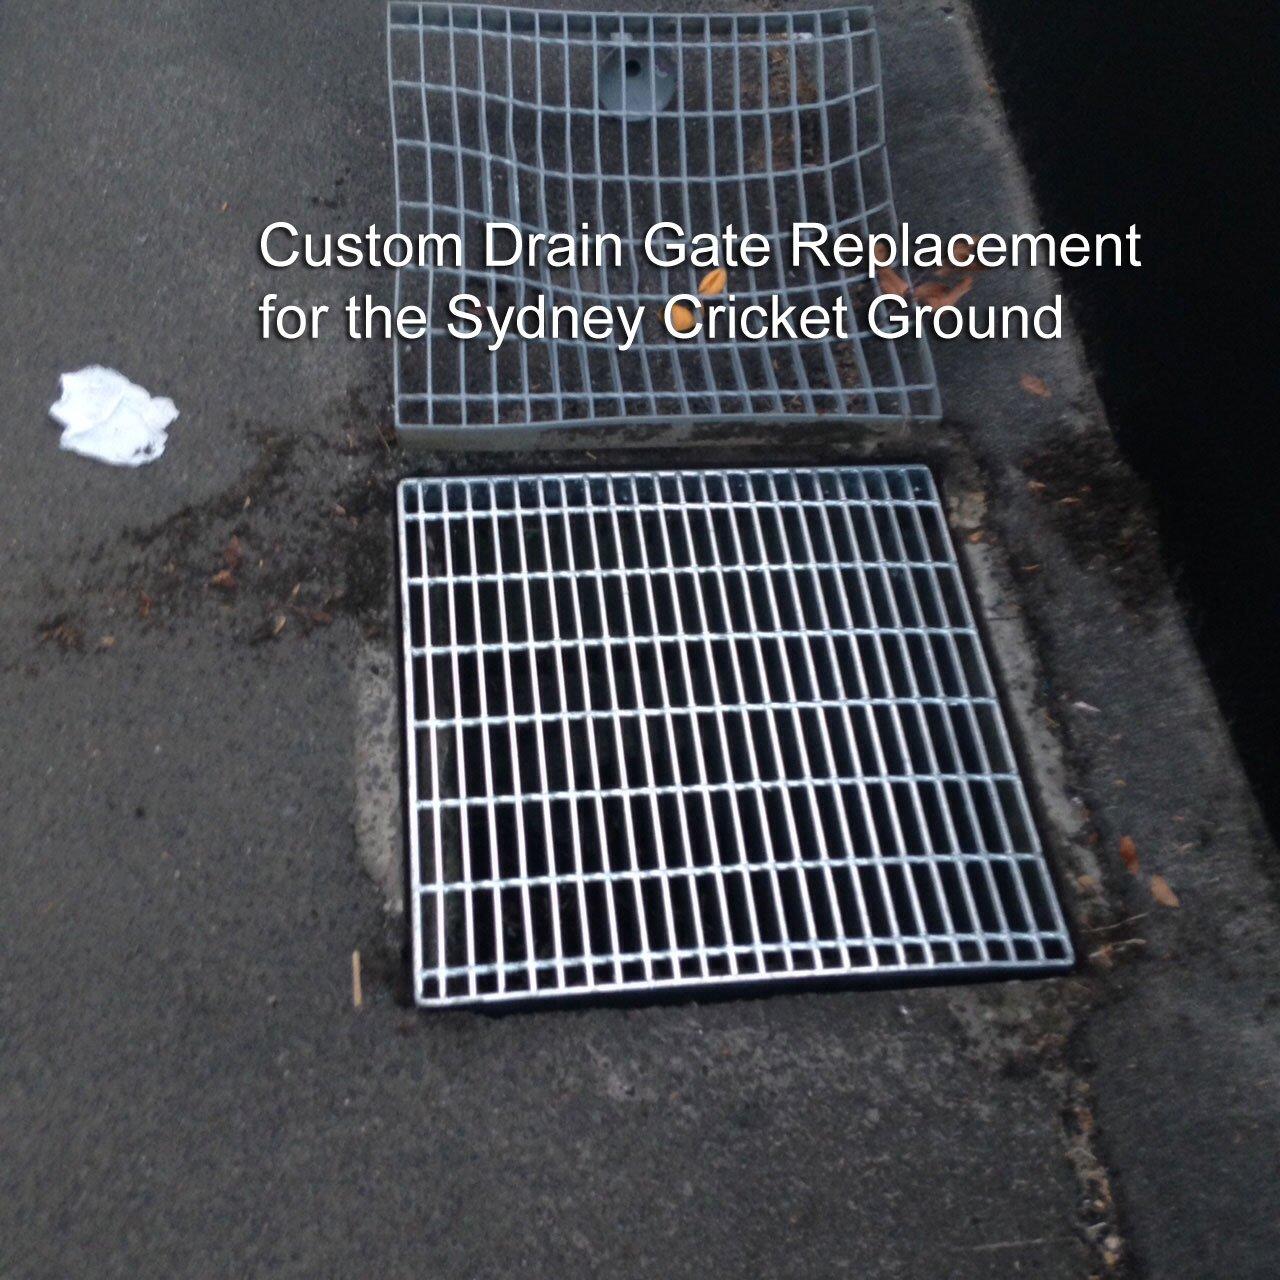 Steel-Fabricated-Drain-Gate